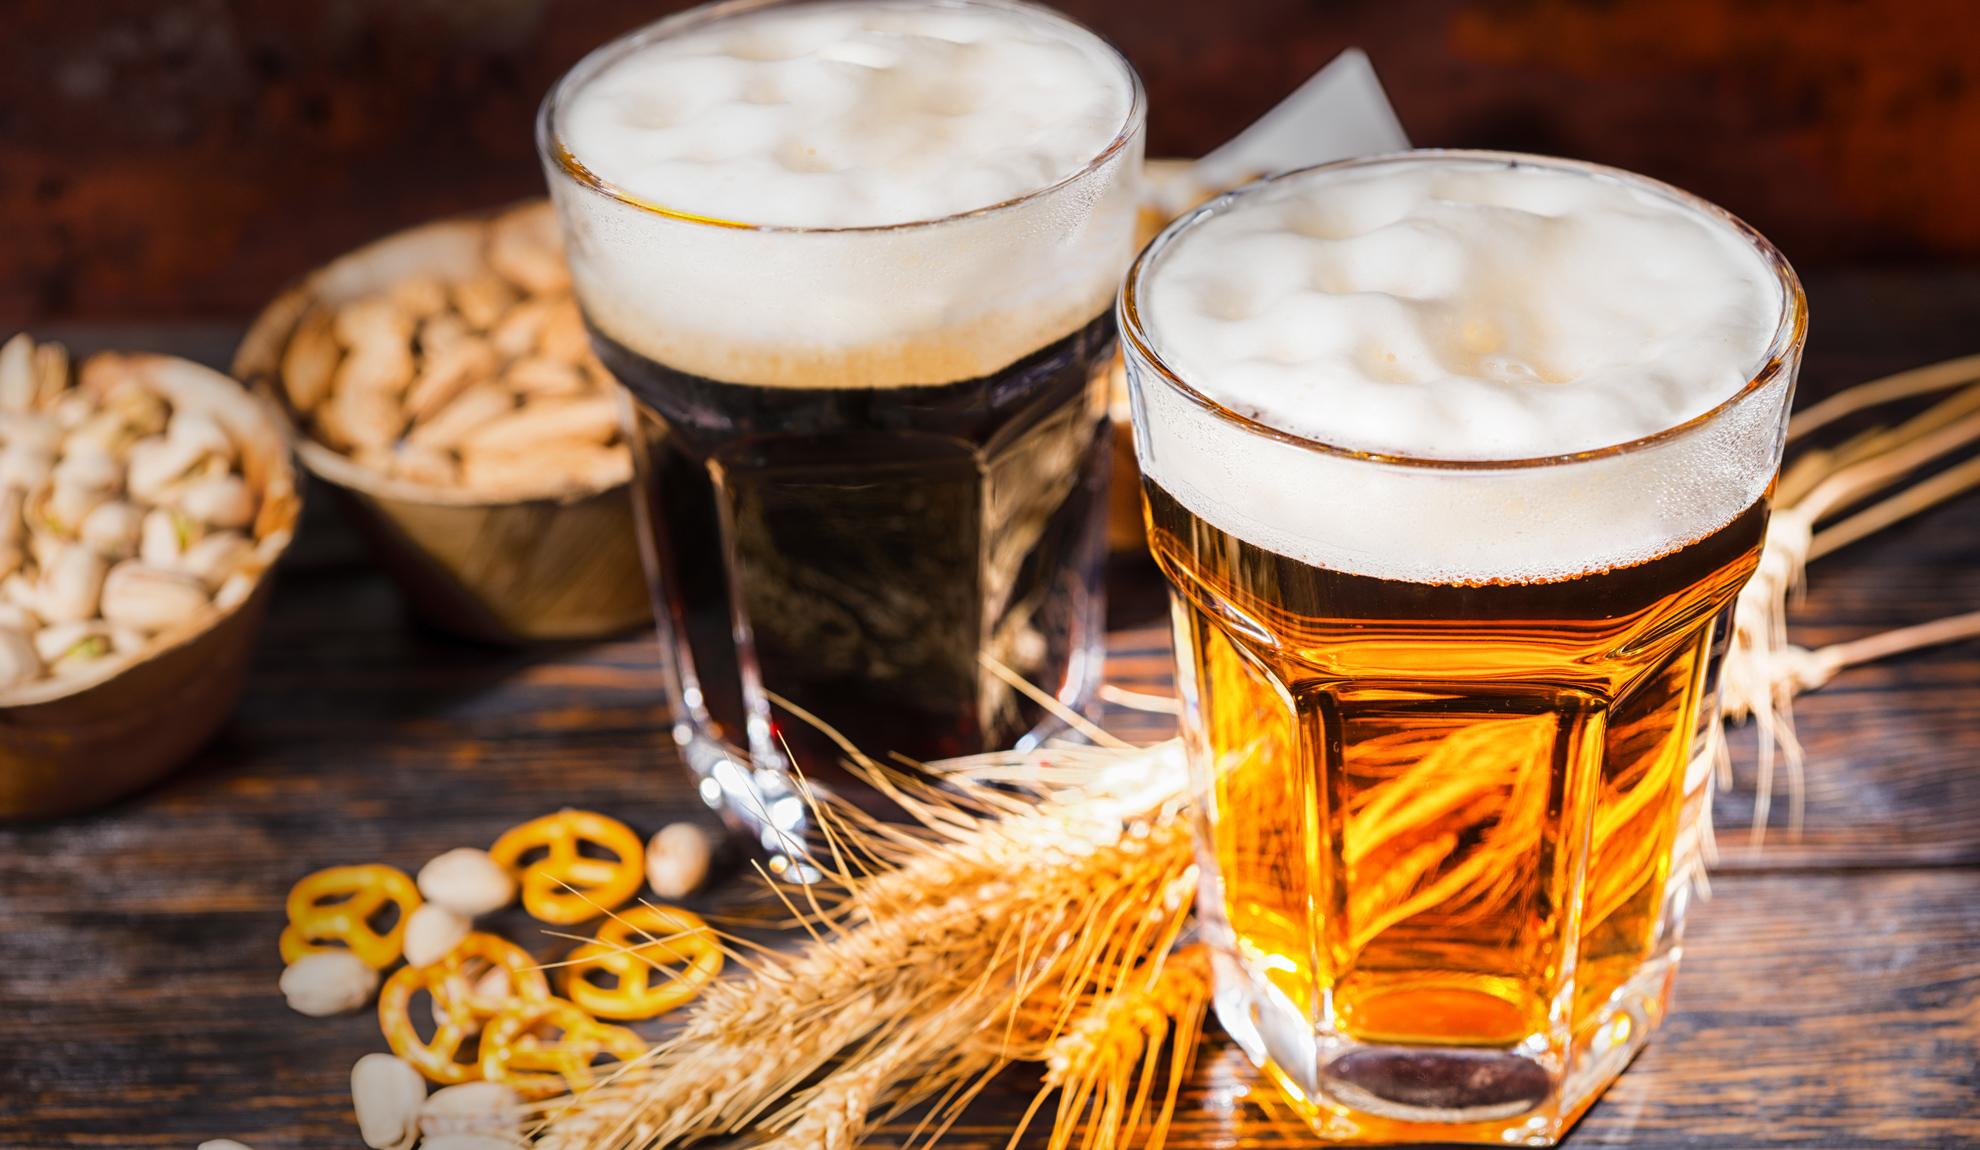 Biergarten Getränkekarte